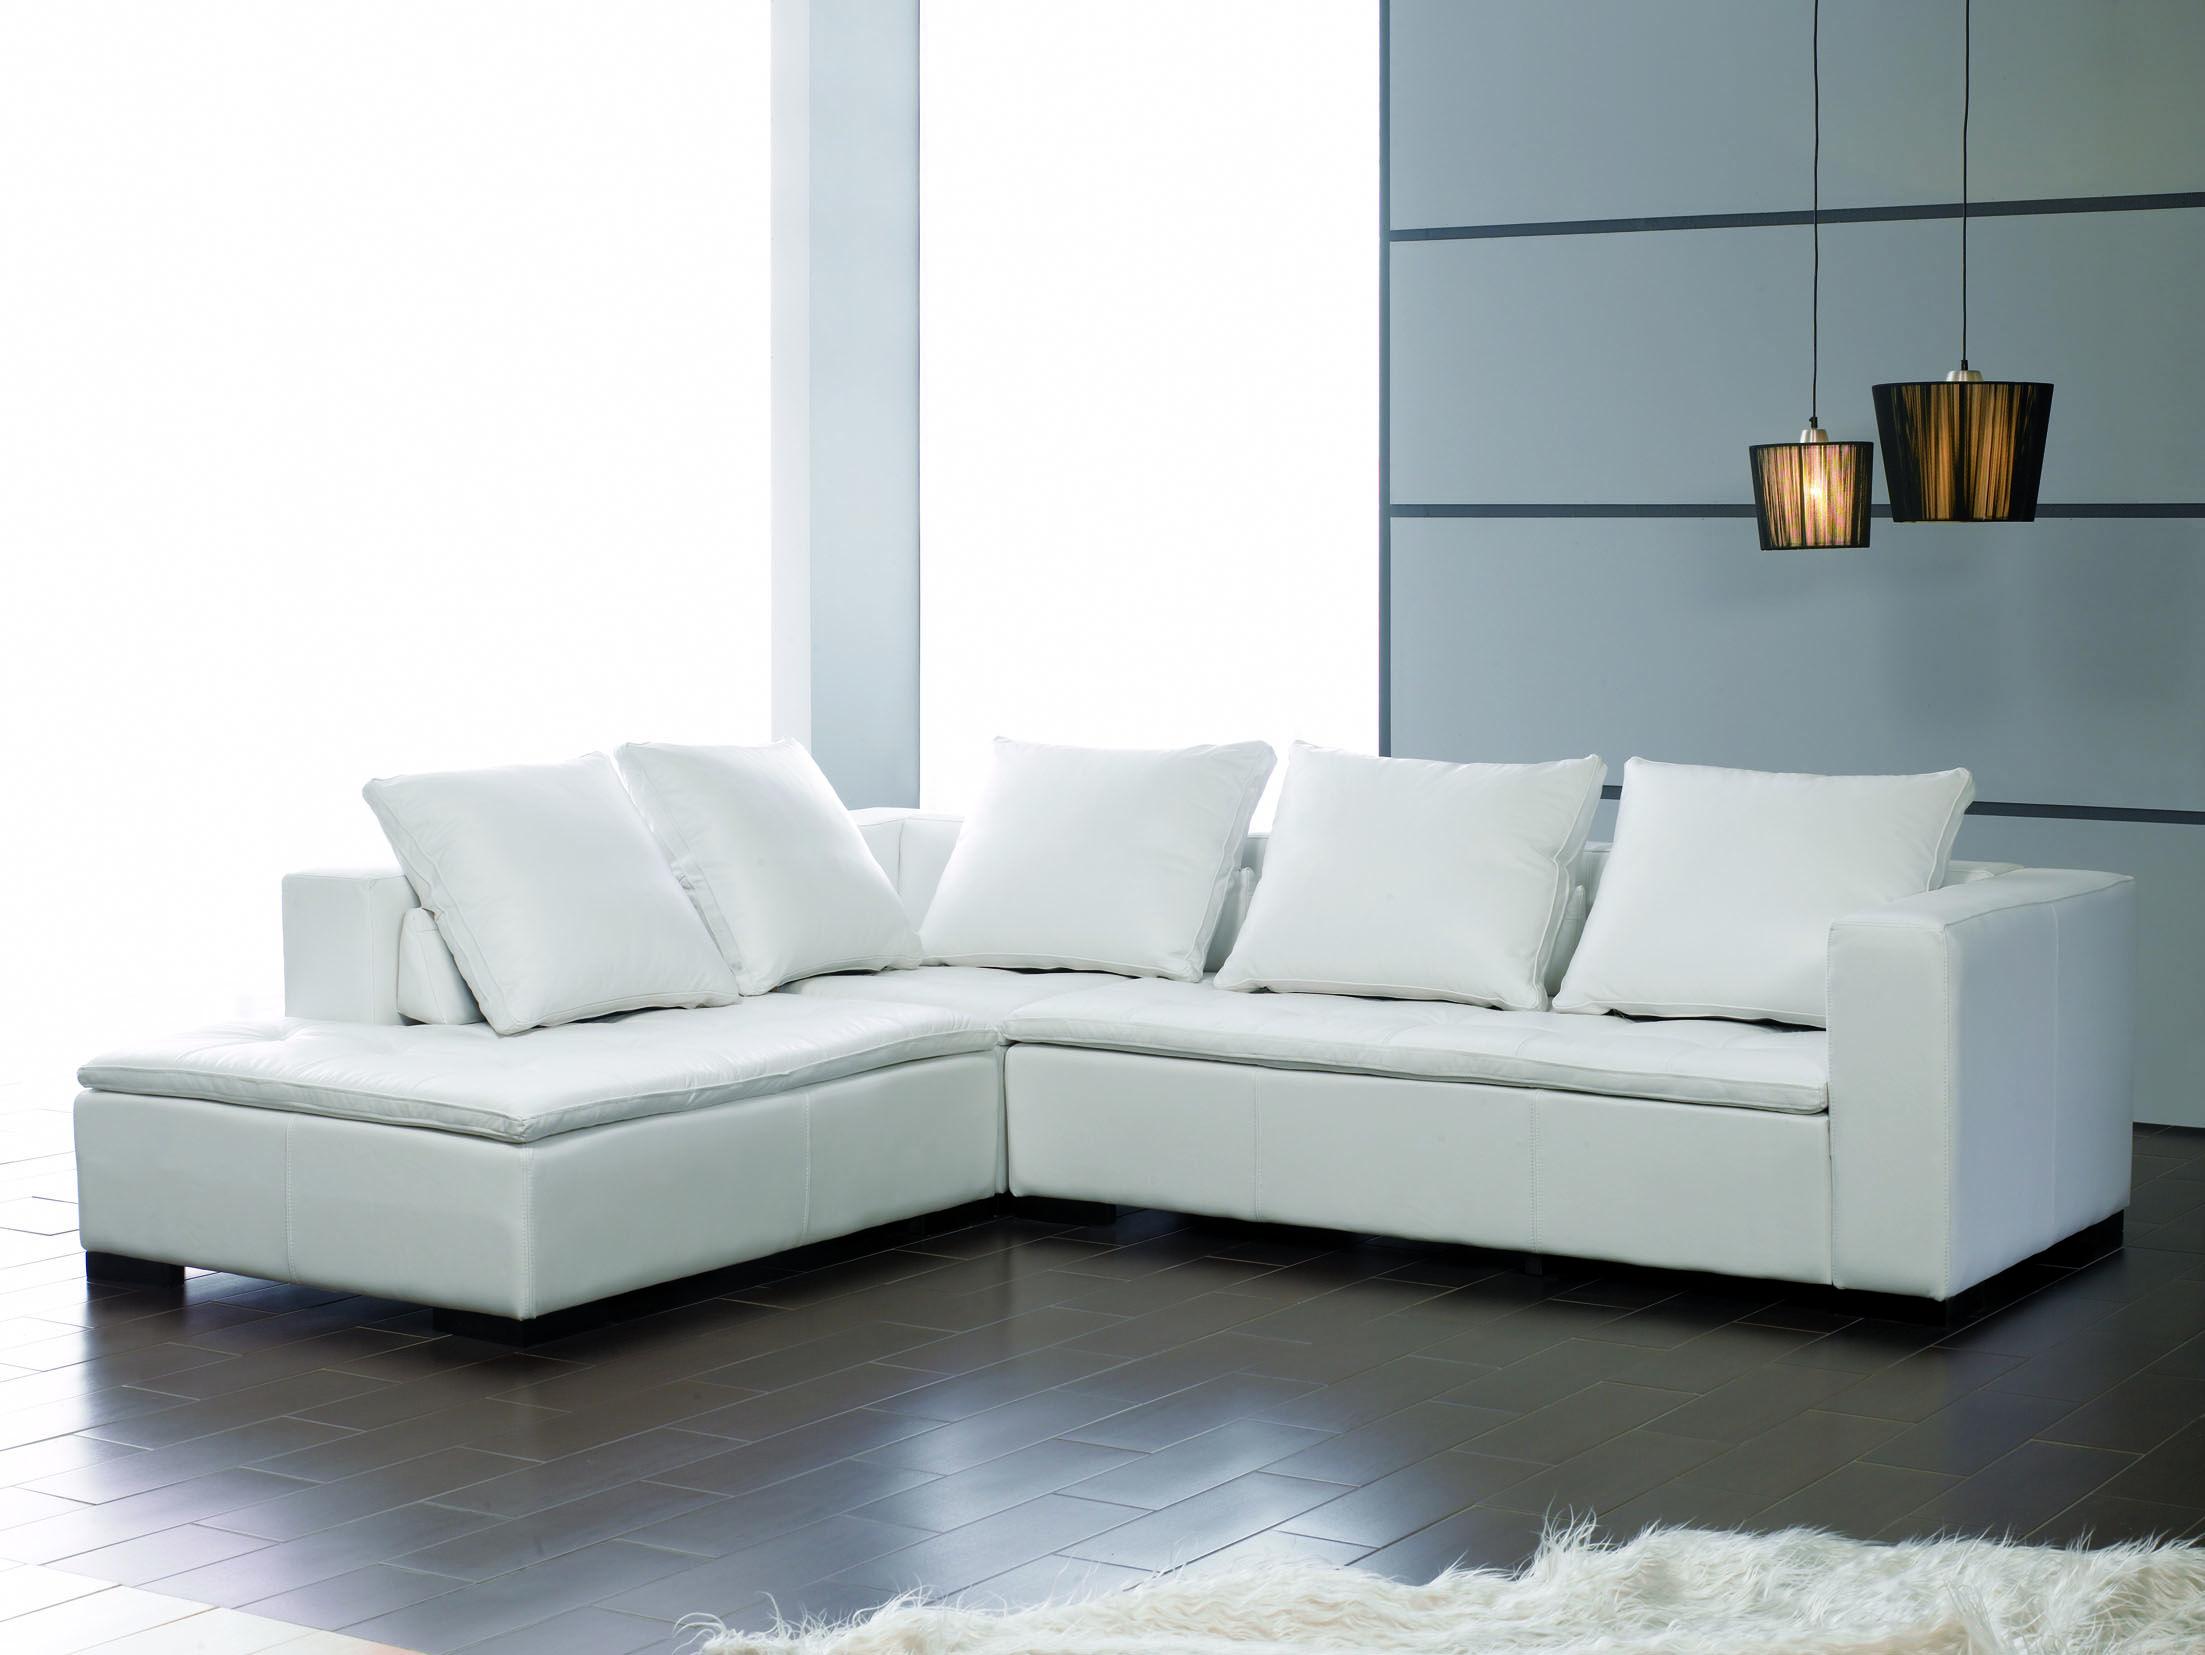 muebles modulares salones modernos | Muebles | Pinterest | Salons ...